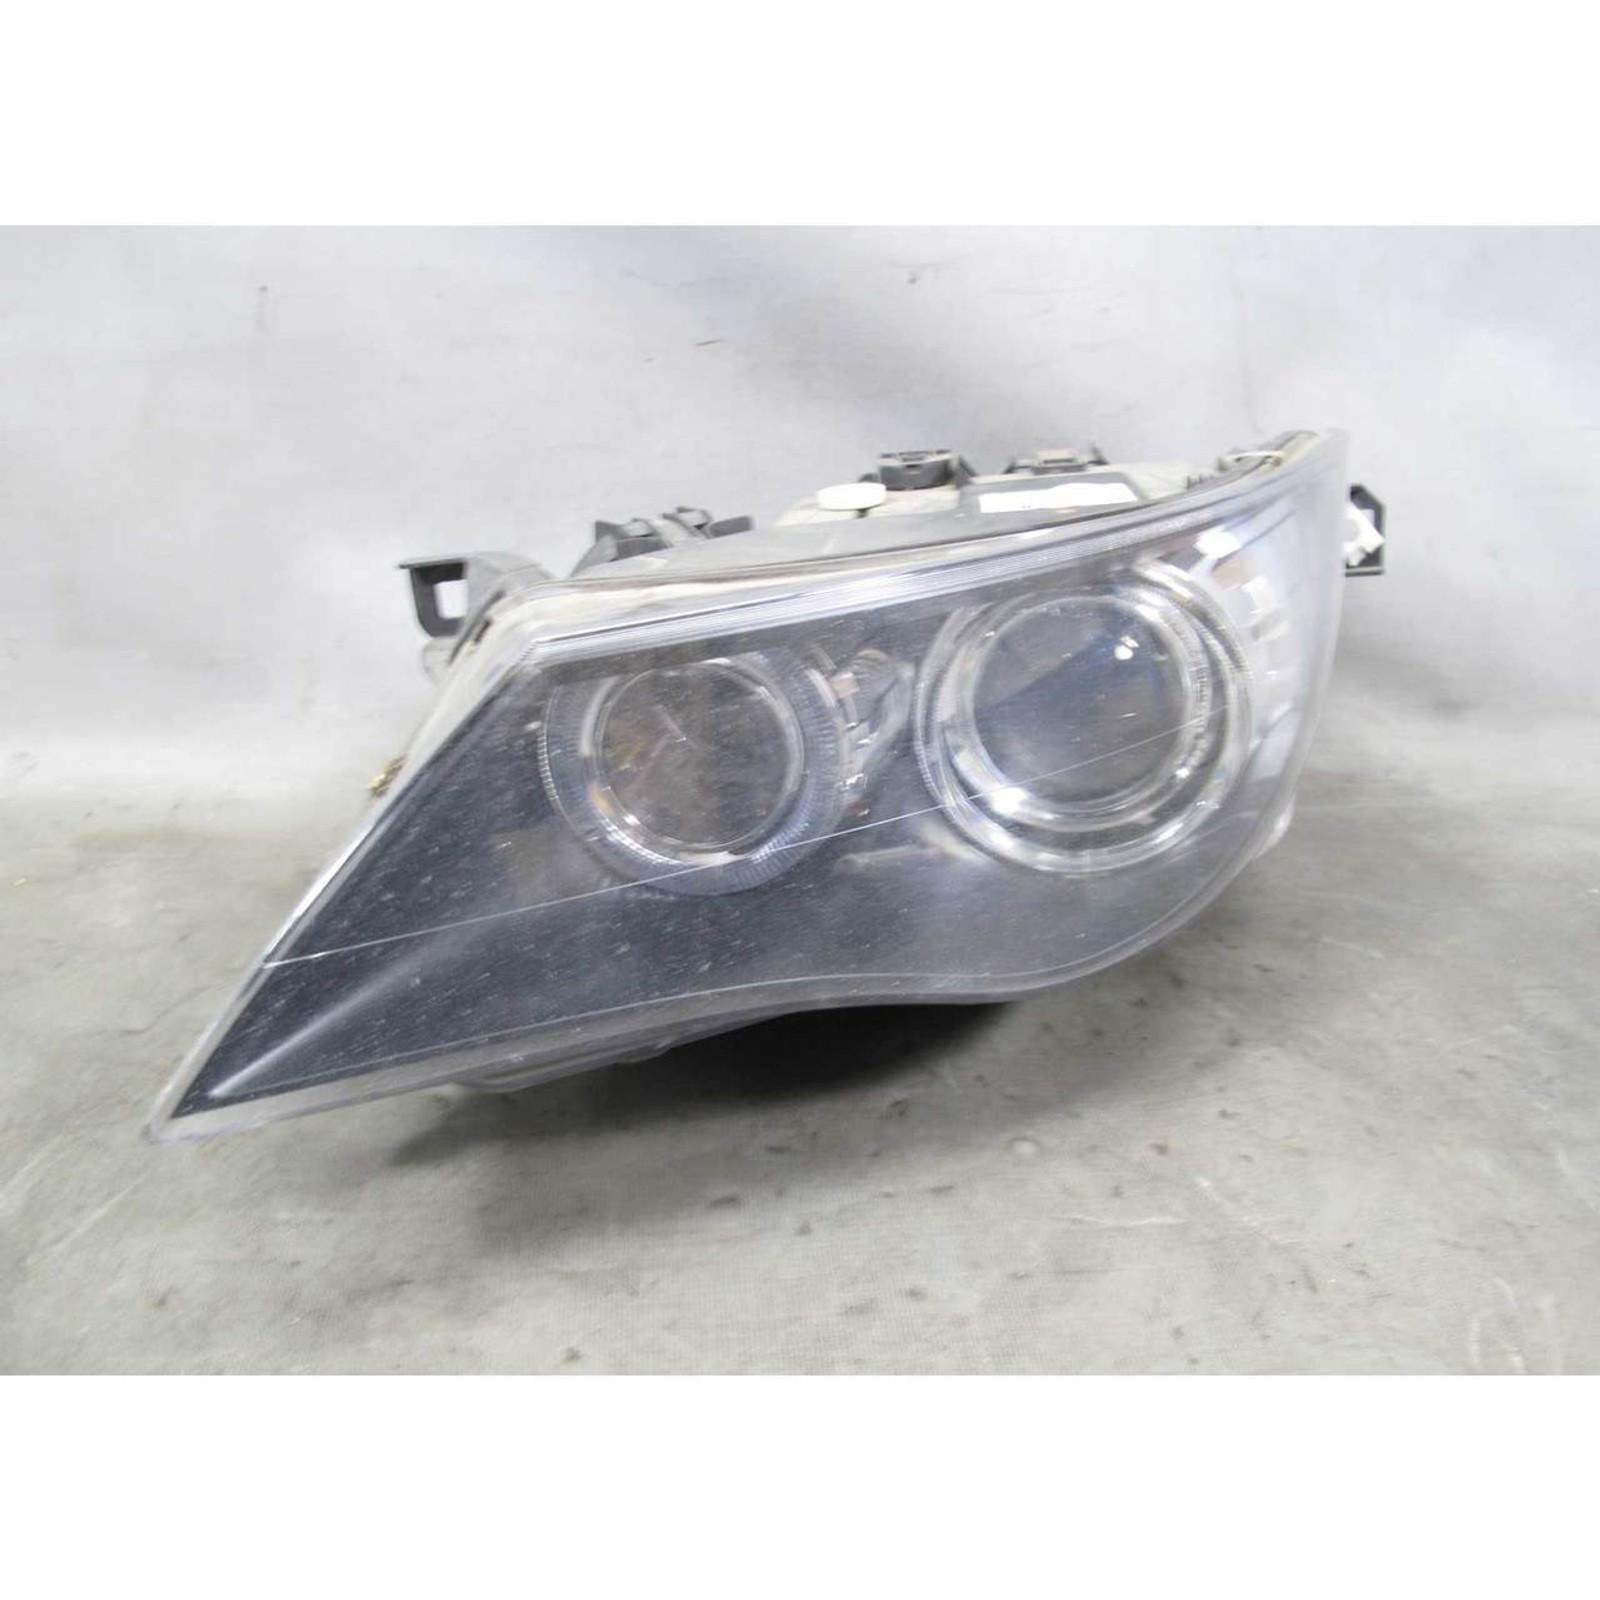 Damaged 2008-2010 BMW 6-Series Left Xenon Adaptive Headlight Parts Repair  E64